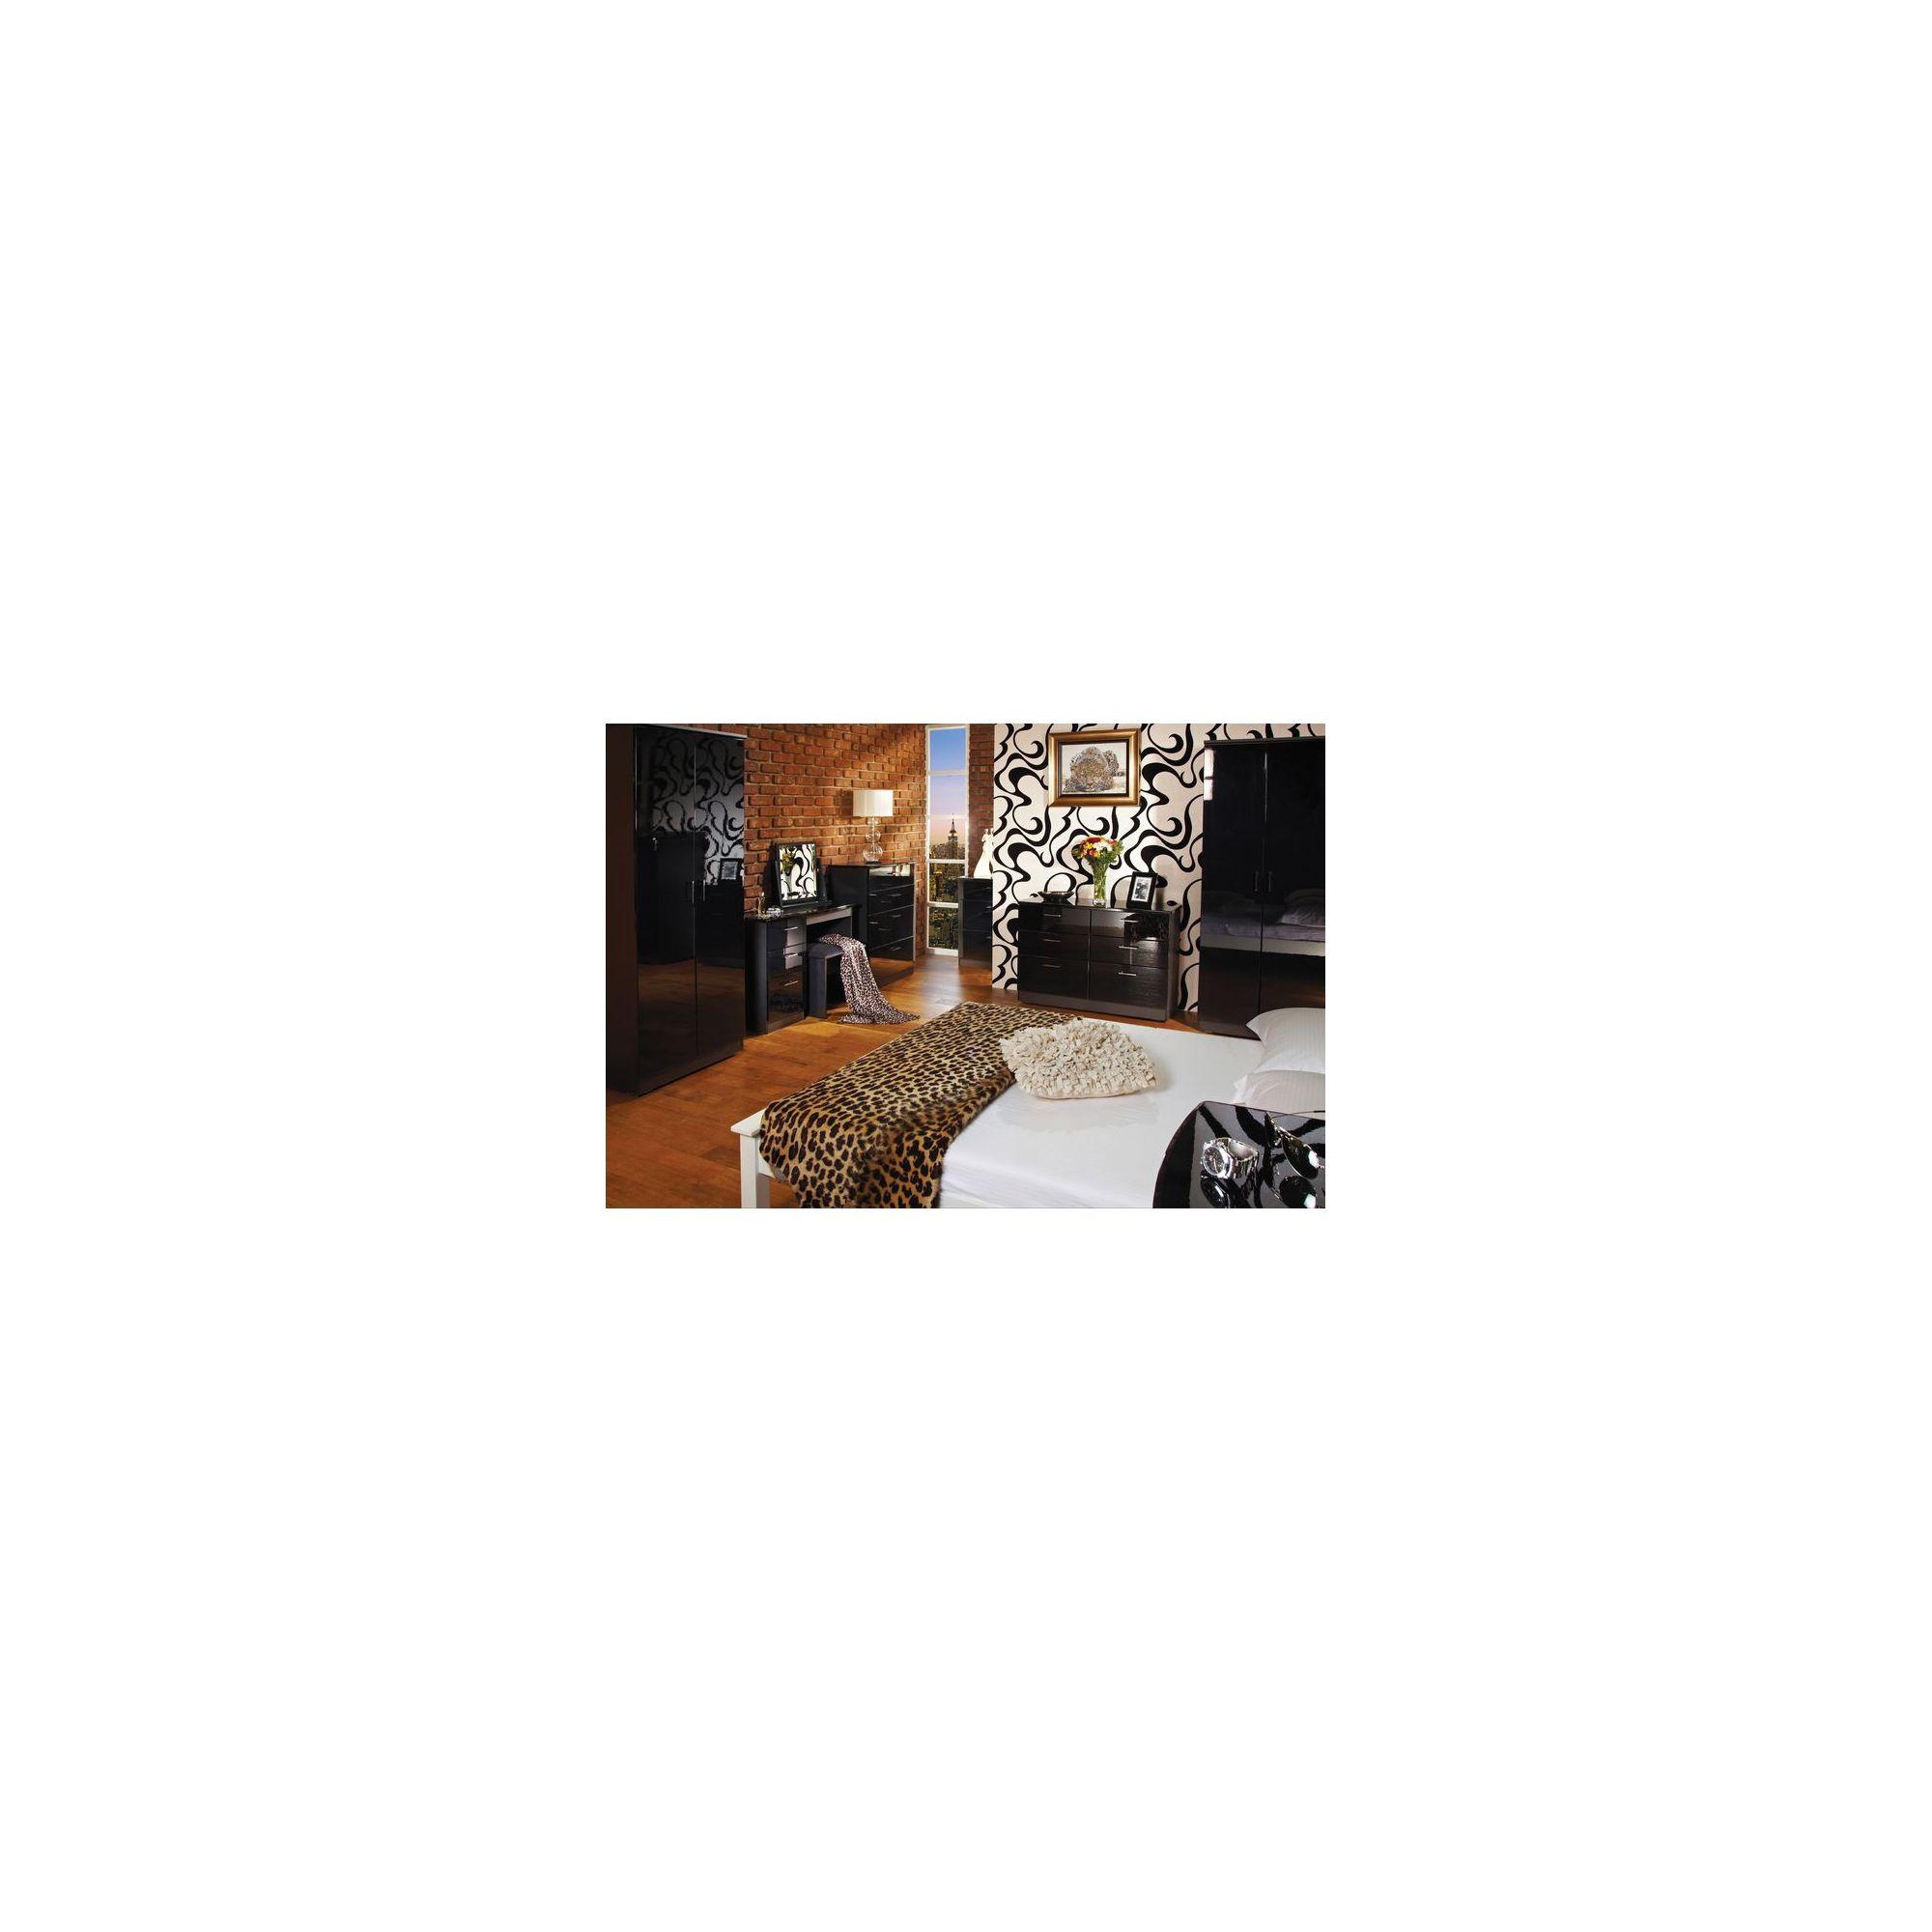 Welcome Furniture Mayfair Tall Plain Wardrobe - Aubergine - Ebony - Black at Tesco Direct